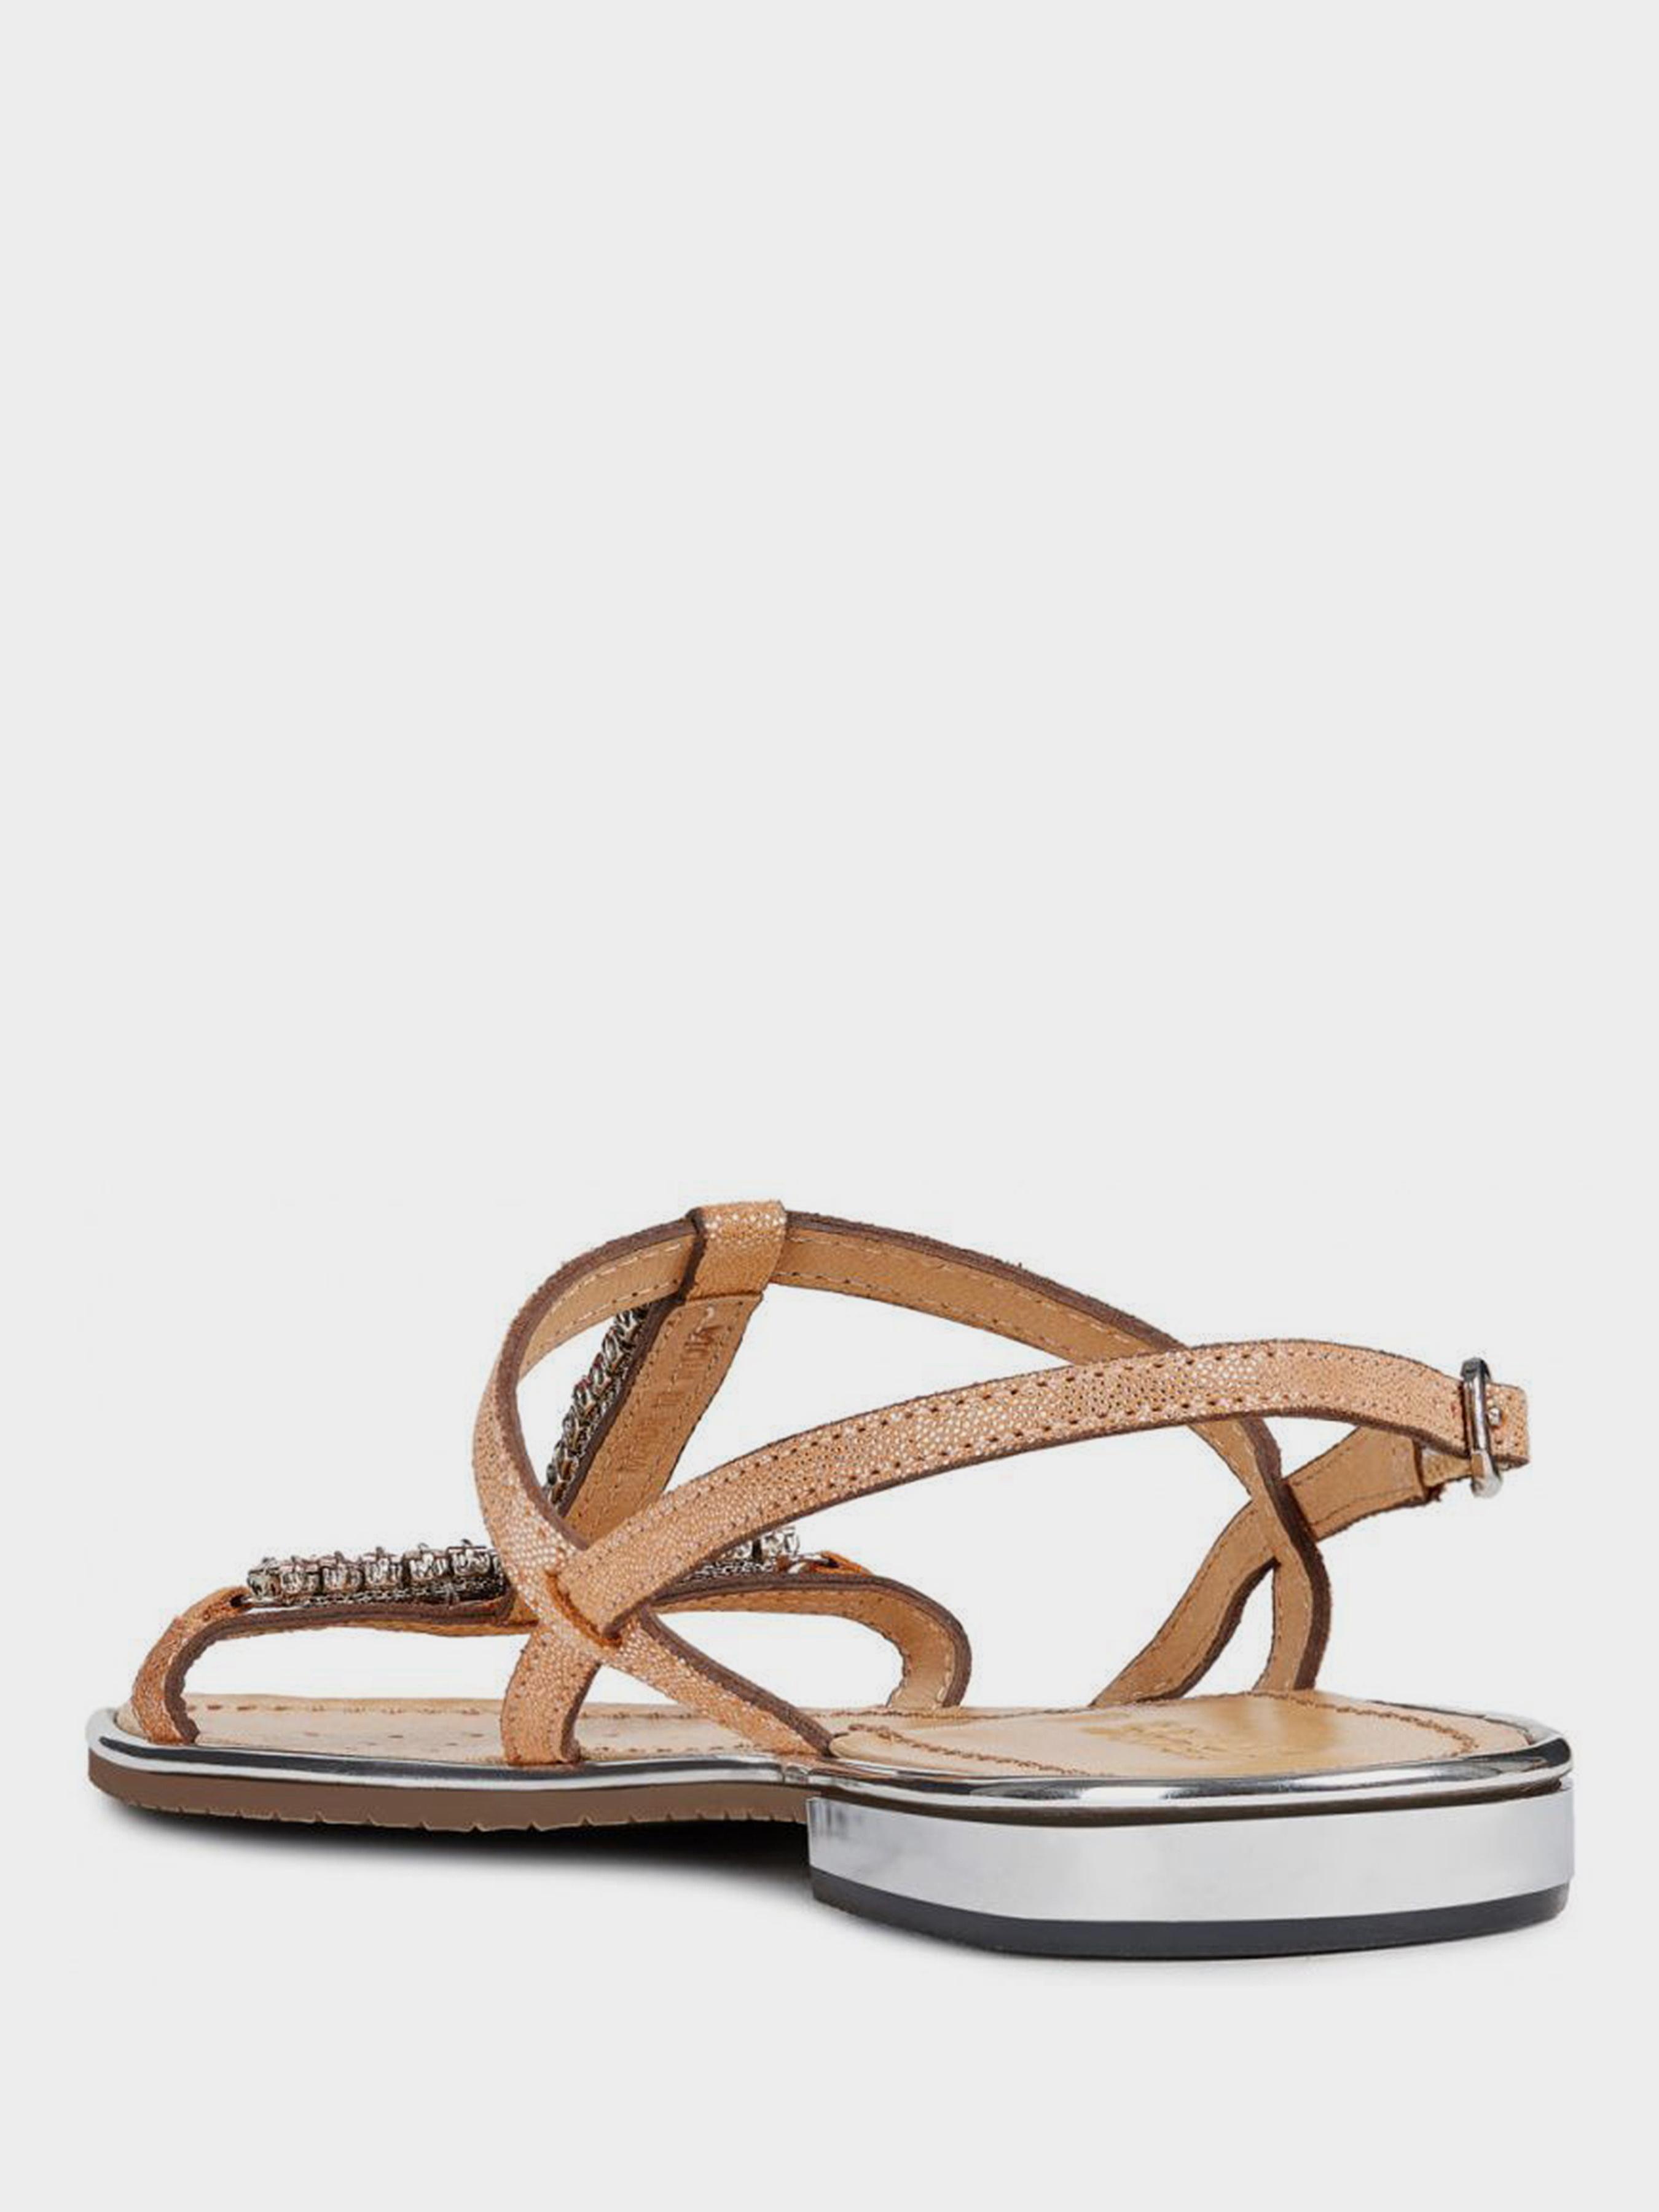 Сандалии женские Geox D SOZY PLUS XW3593 размеры обуви, 2017